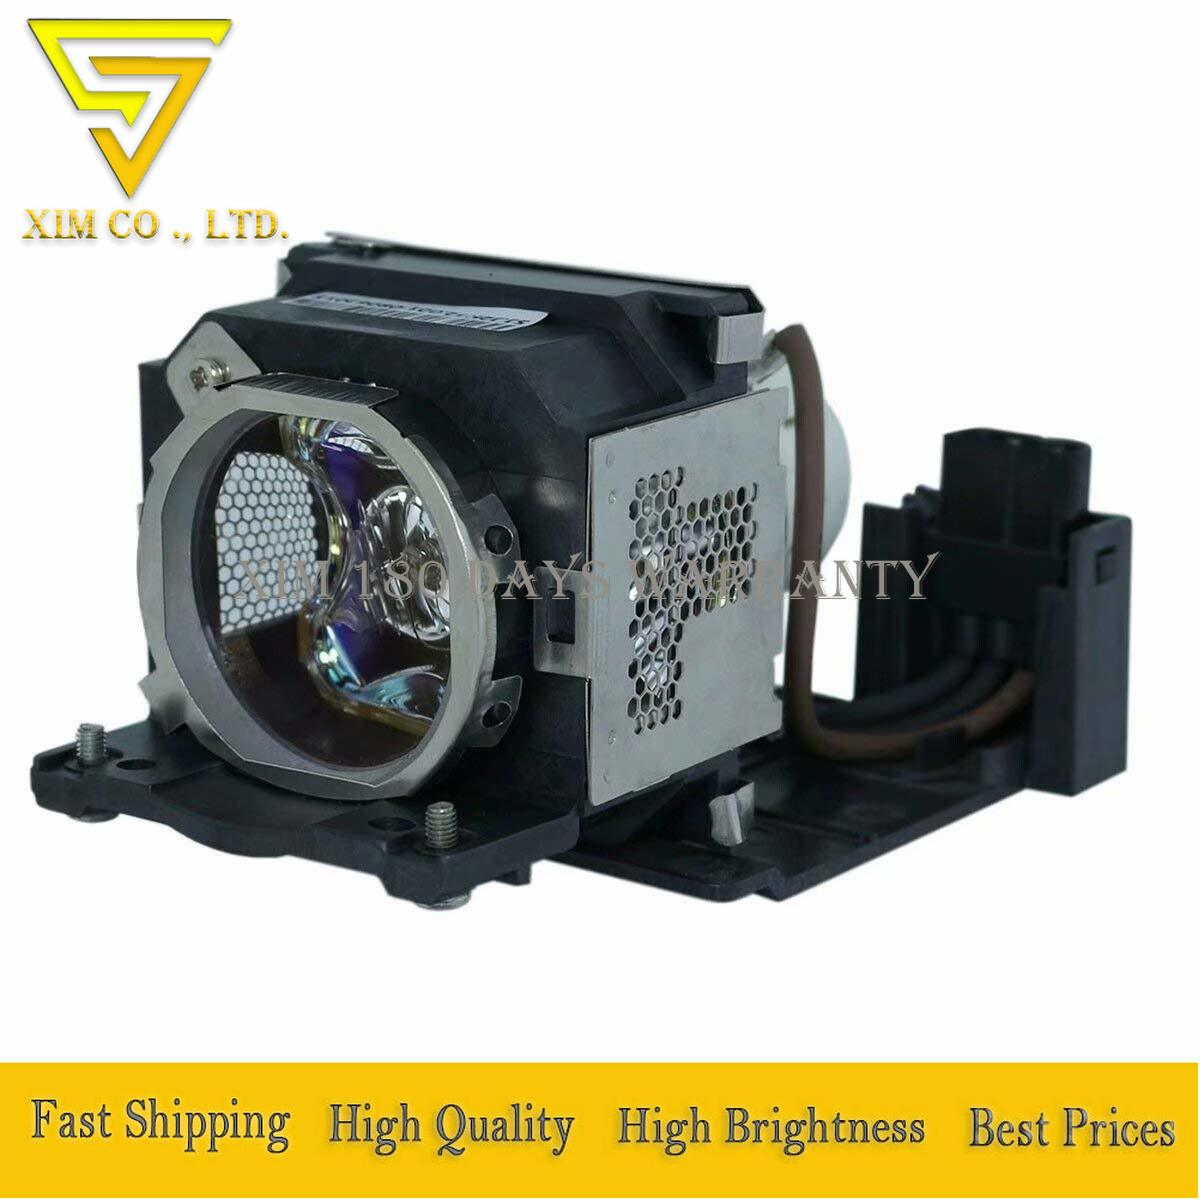 5J.J2K02.001 Professional Replacement Projector Lamp 5J.J2K02.001 with Housing for BENQ W500 projectors ec jbu00 001 replacement projector bare bulb with housing for acer x110p x1161p x1261p h110p x1161pa x1161n projectors